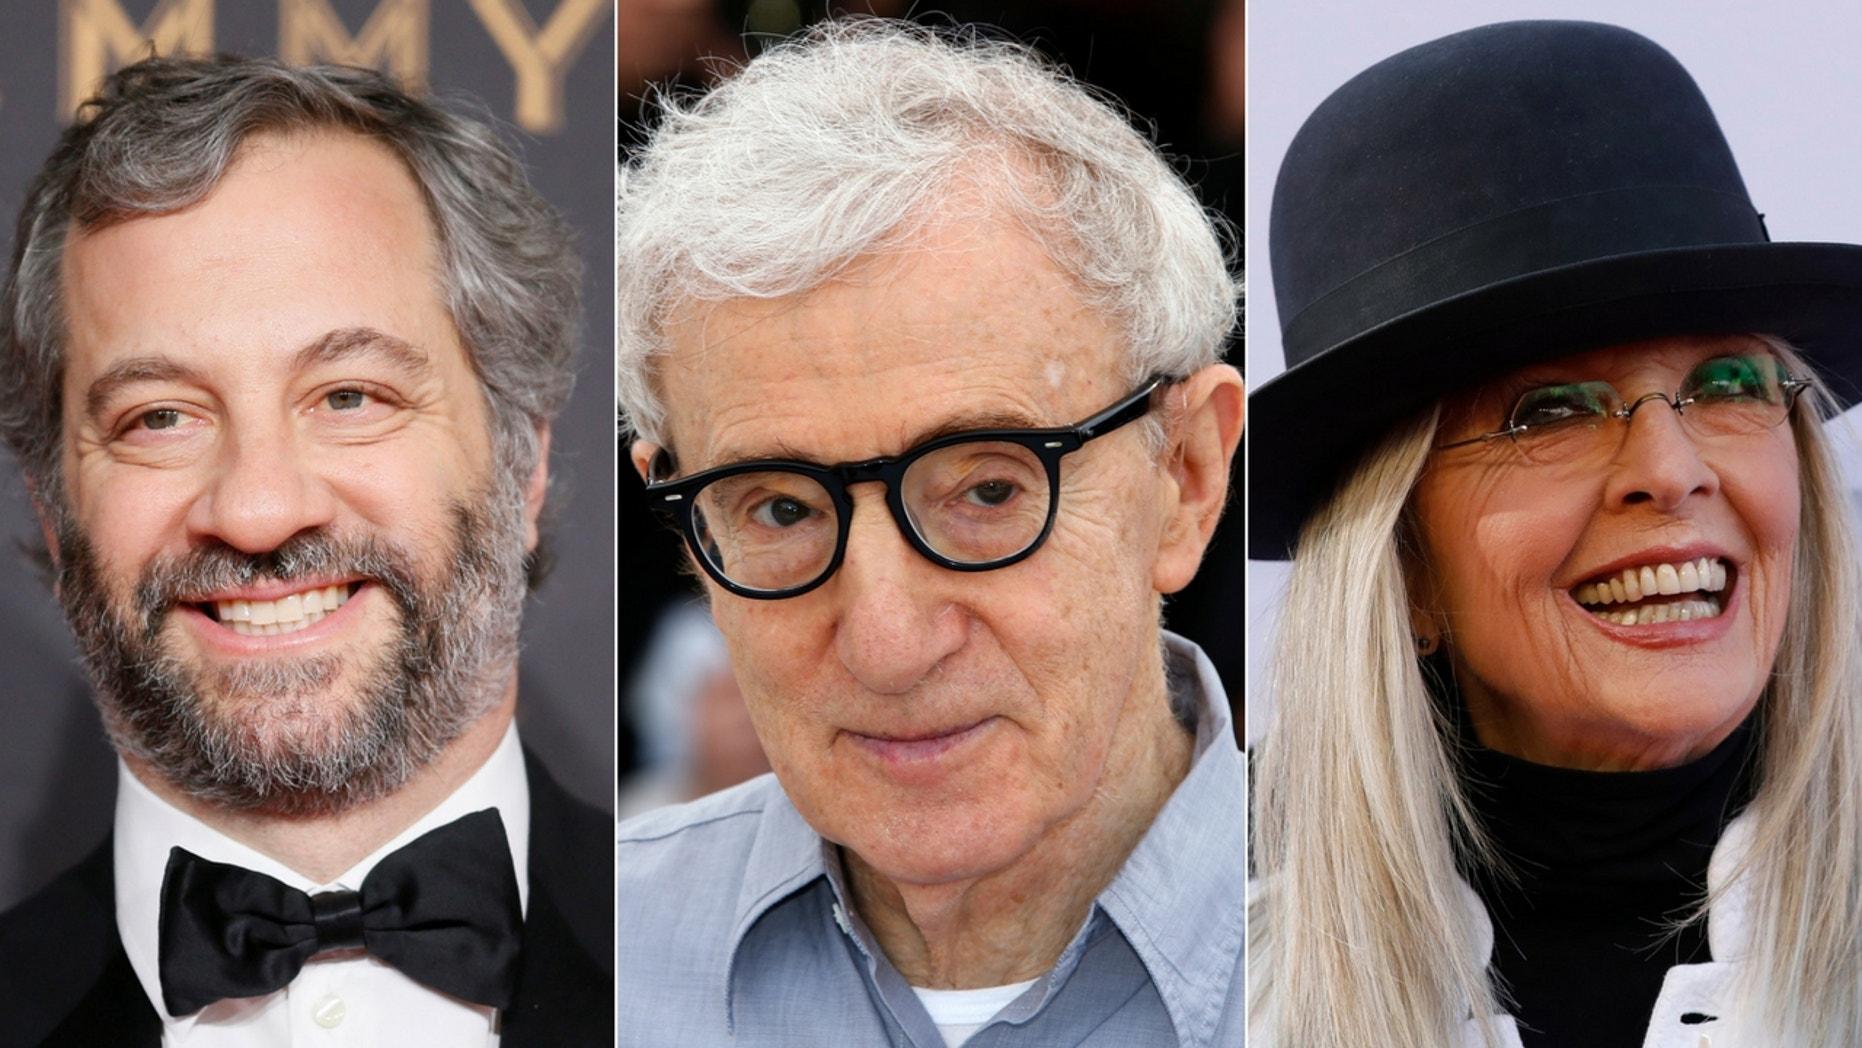 Judd Apatow slammed Diane Keaton's defense of Woody Allen.